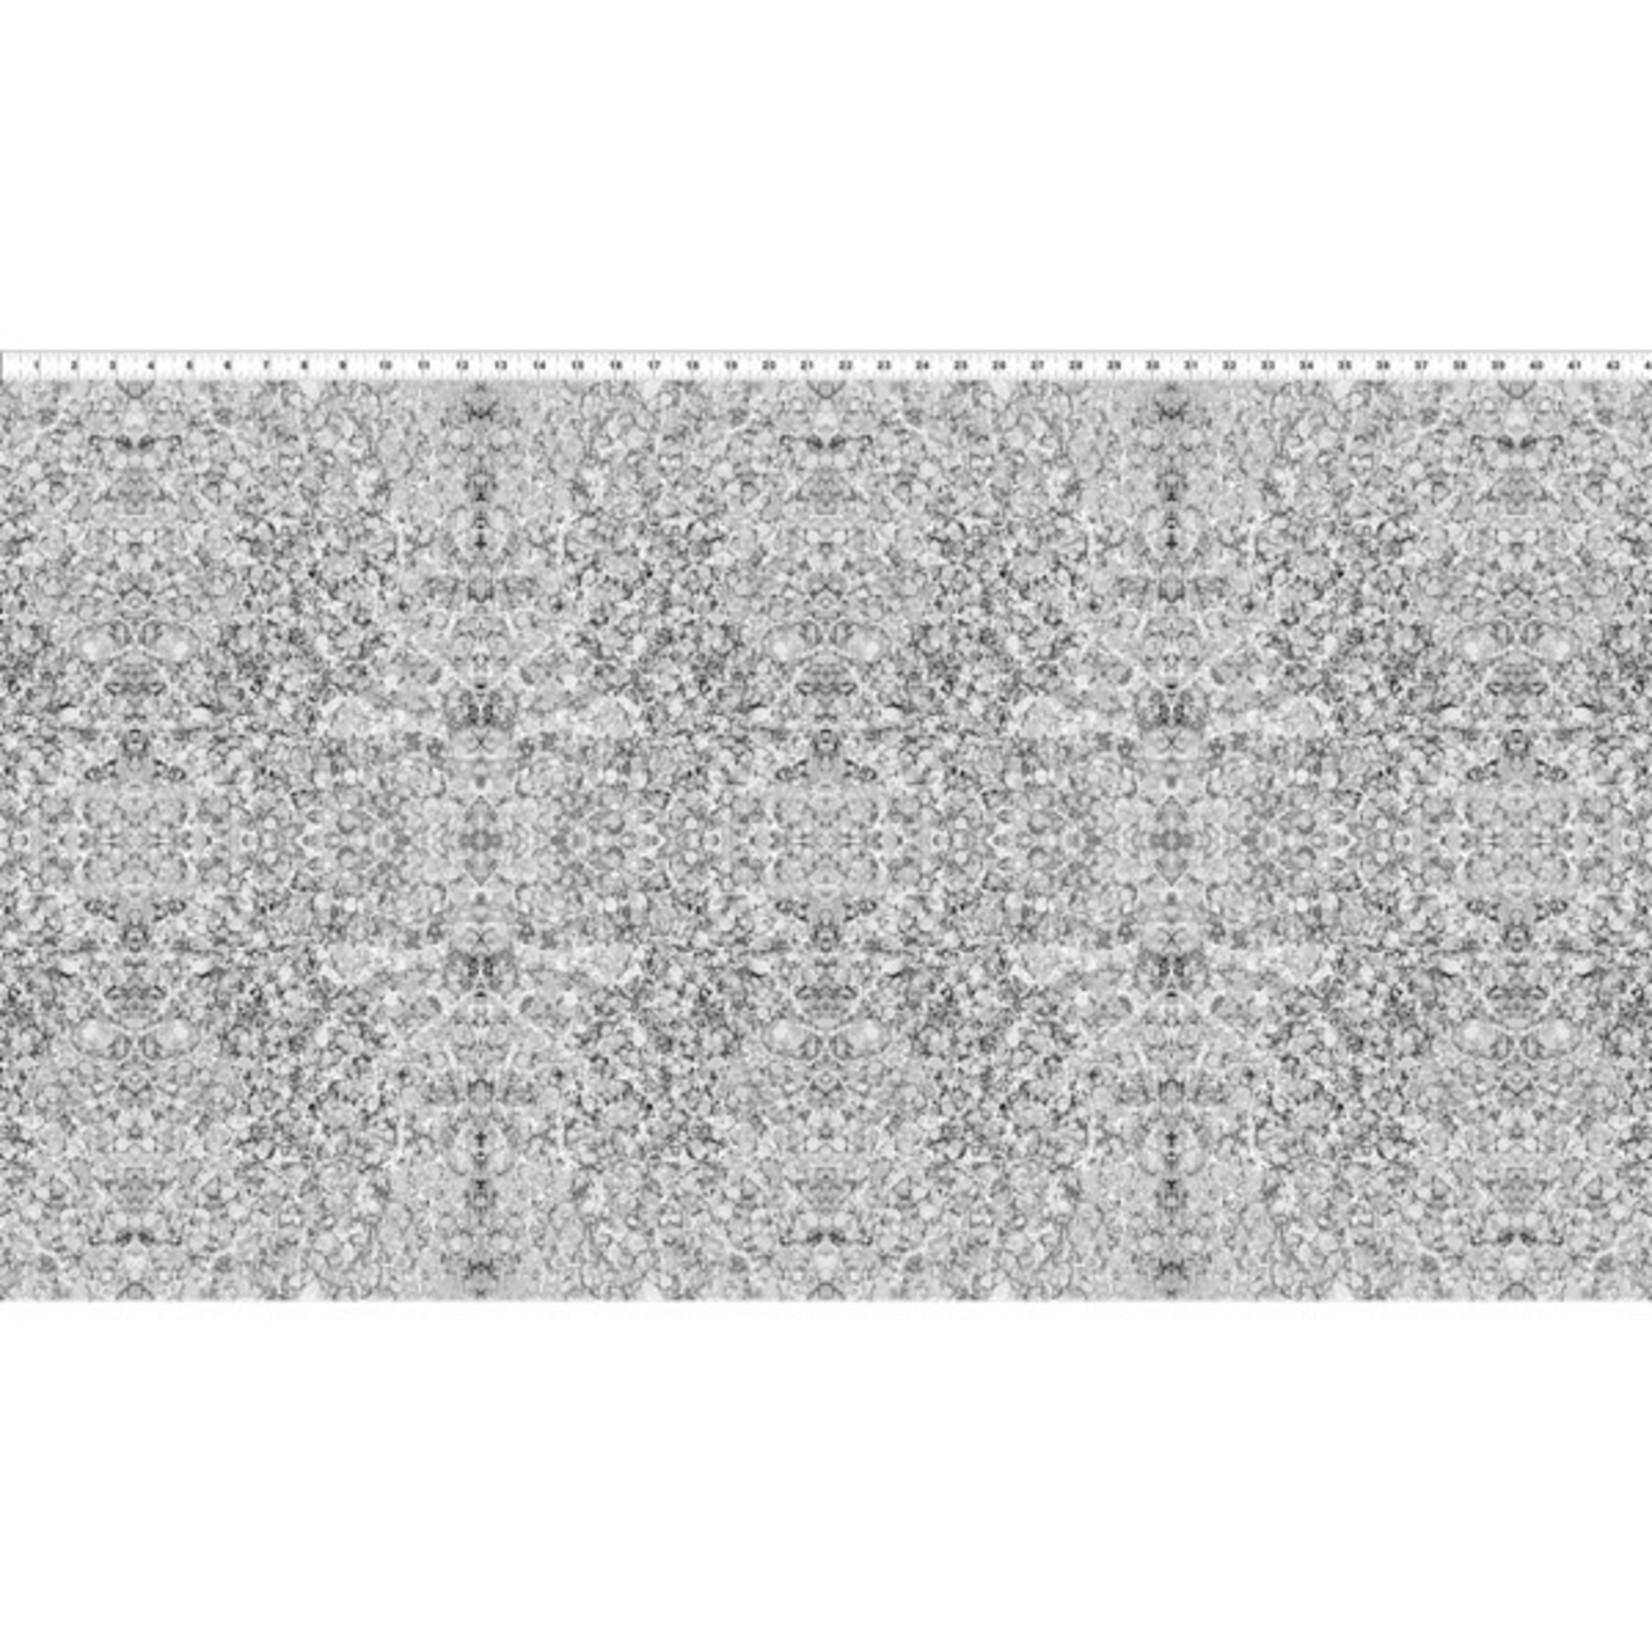 In the Beginning Fabrics Marble Essence - Napoli - Gray